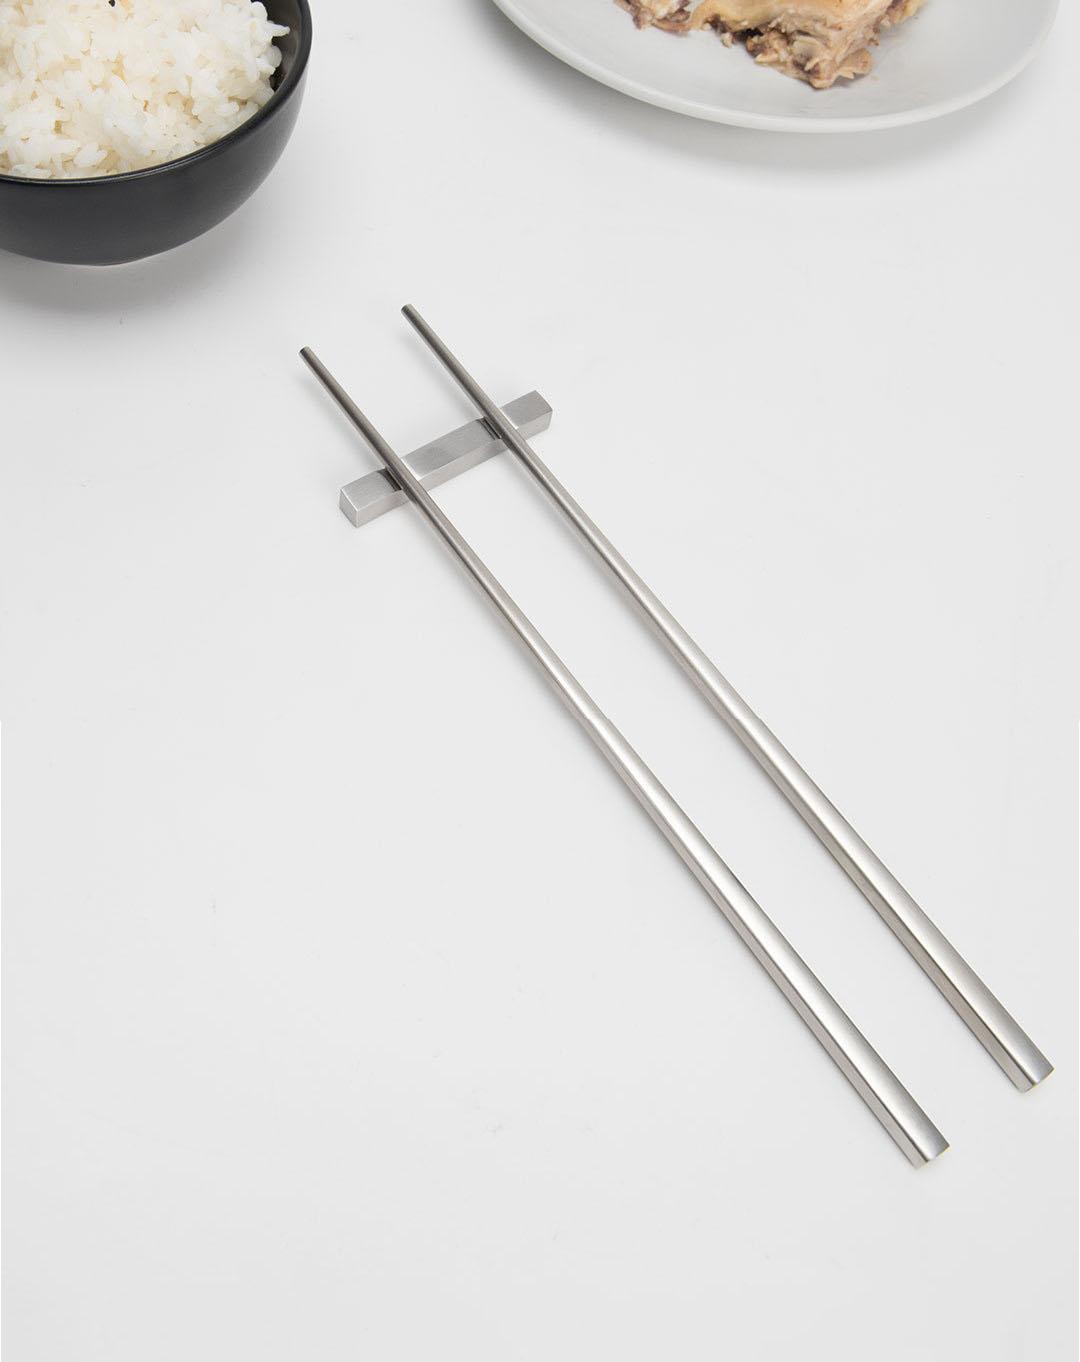 4PCS Home Chopsticks Food Grad 304 Stainless Steel Chopsticks Tableware Chinese Chopsticks Culture From Xiaomi Youpin